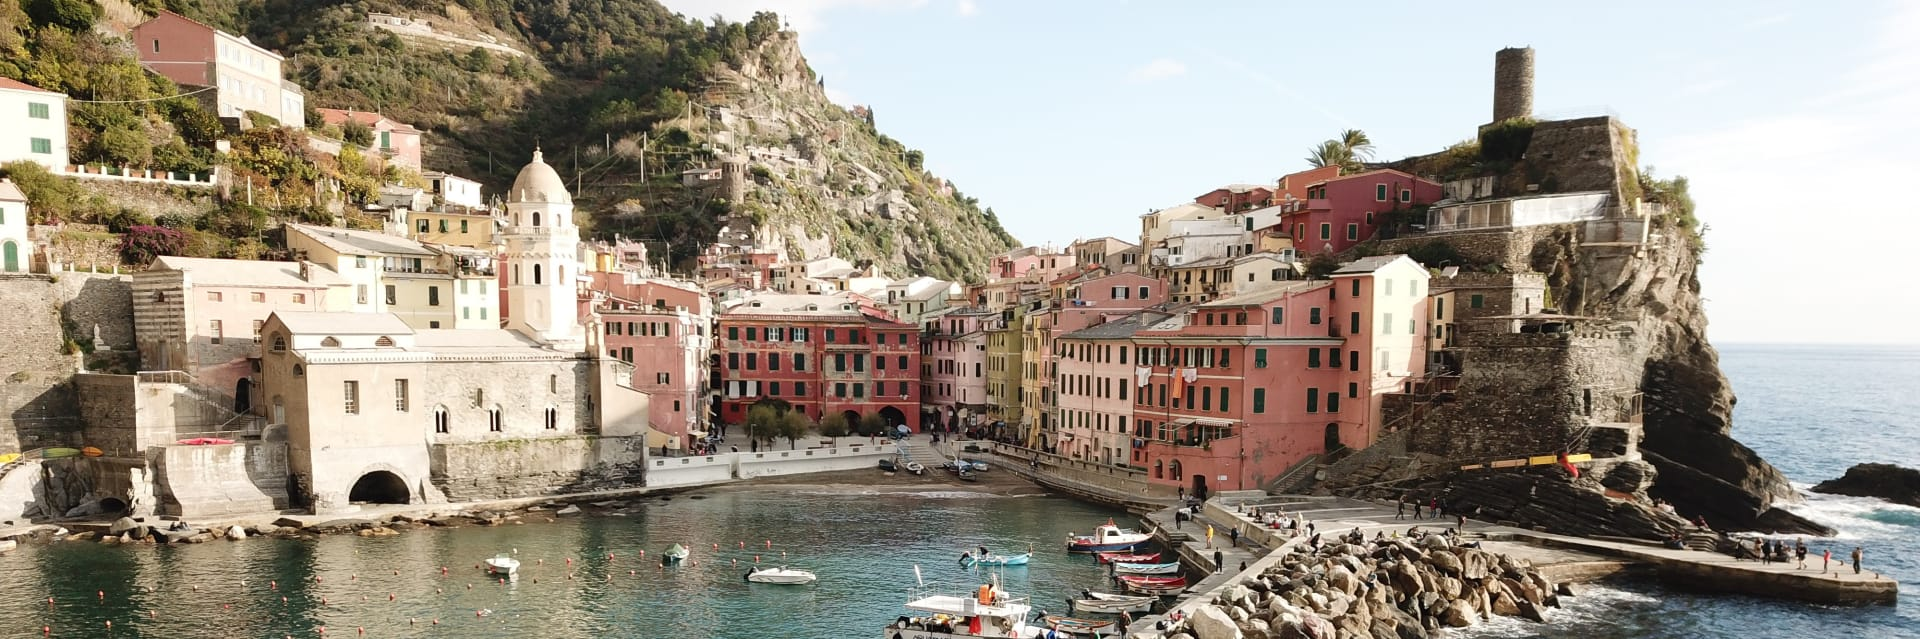 Tuscany-Homepage-Banner-Photo-w1920.jpg